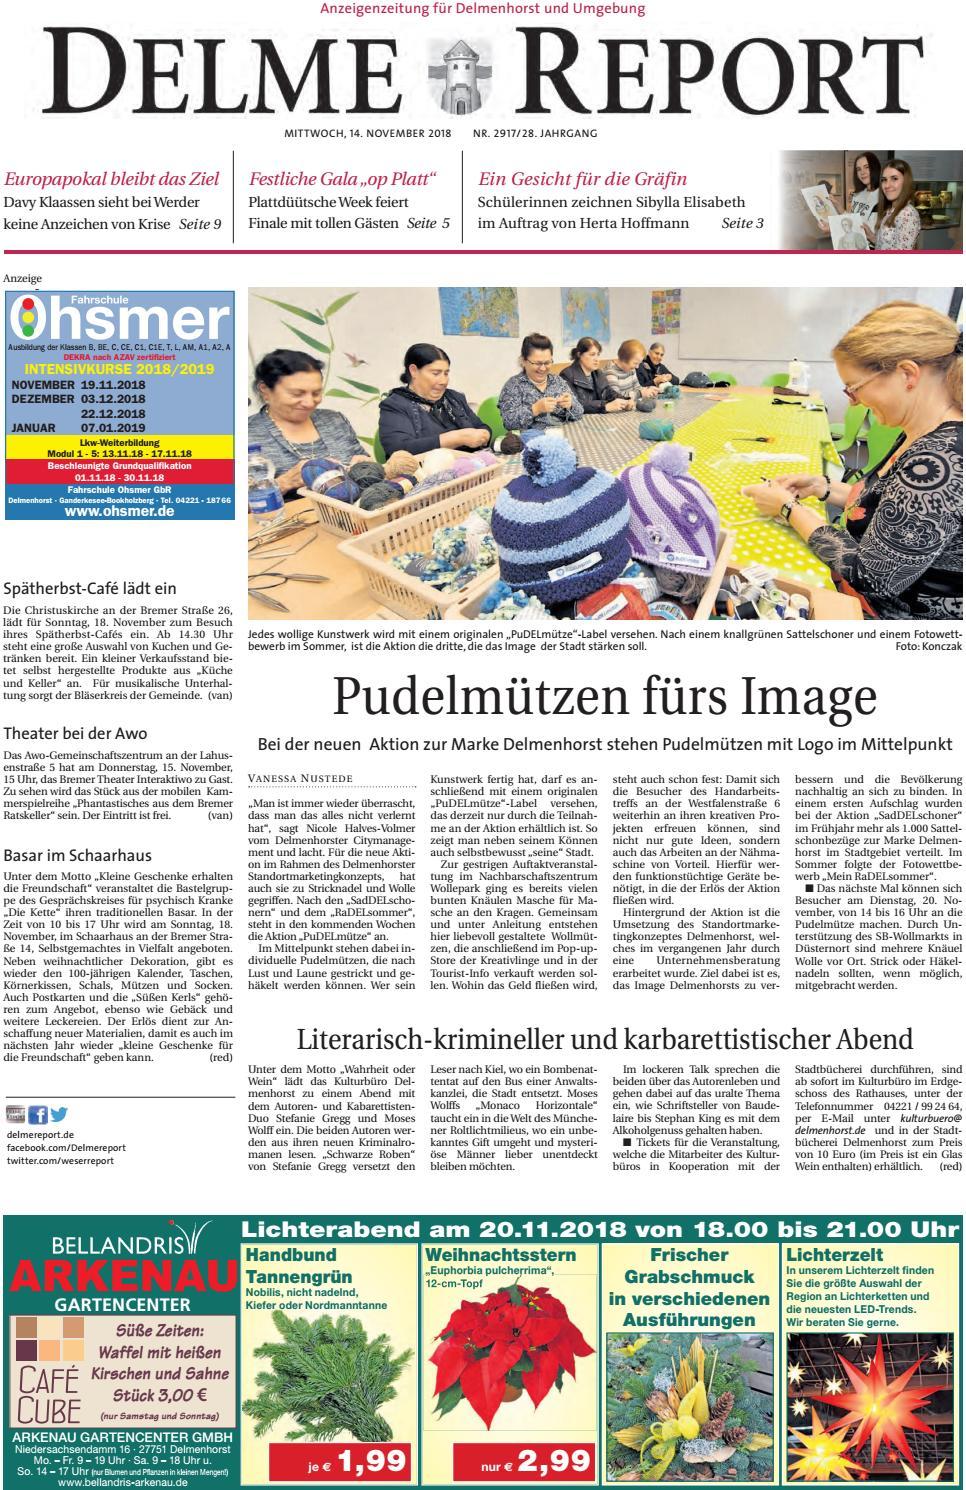 Delme Report Vom 14 11 2018 By Kps Verlagsgesellschaft Mbh Issuu